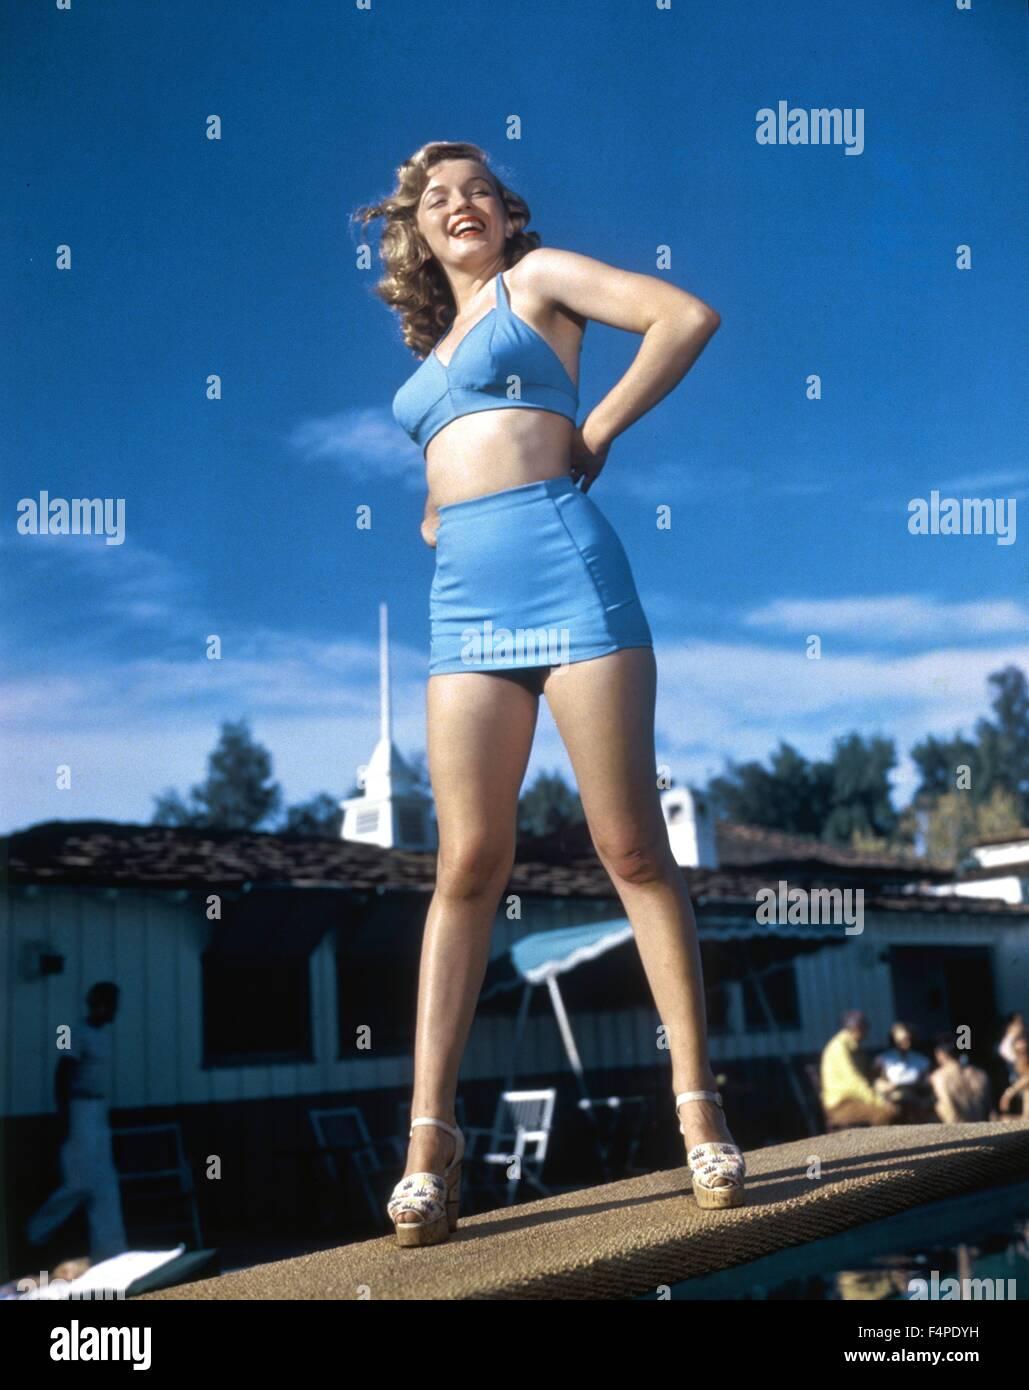 Marilyn Monroe in 1948/49 - Stock Image